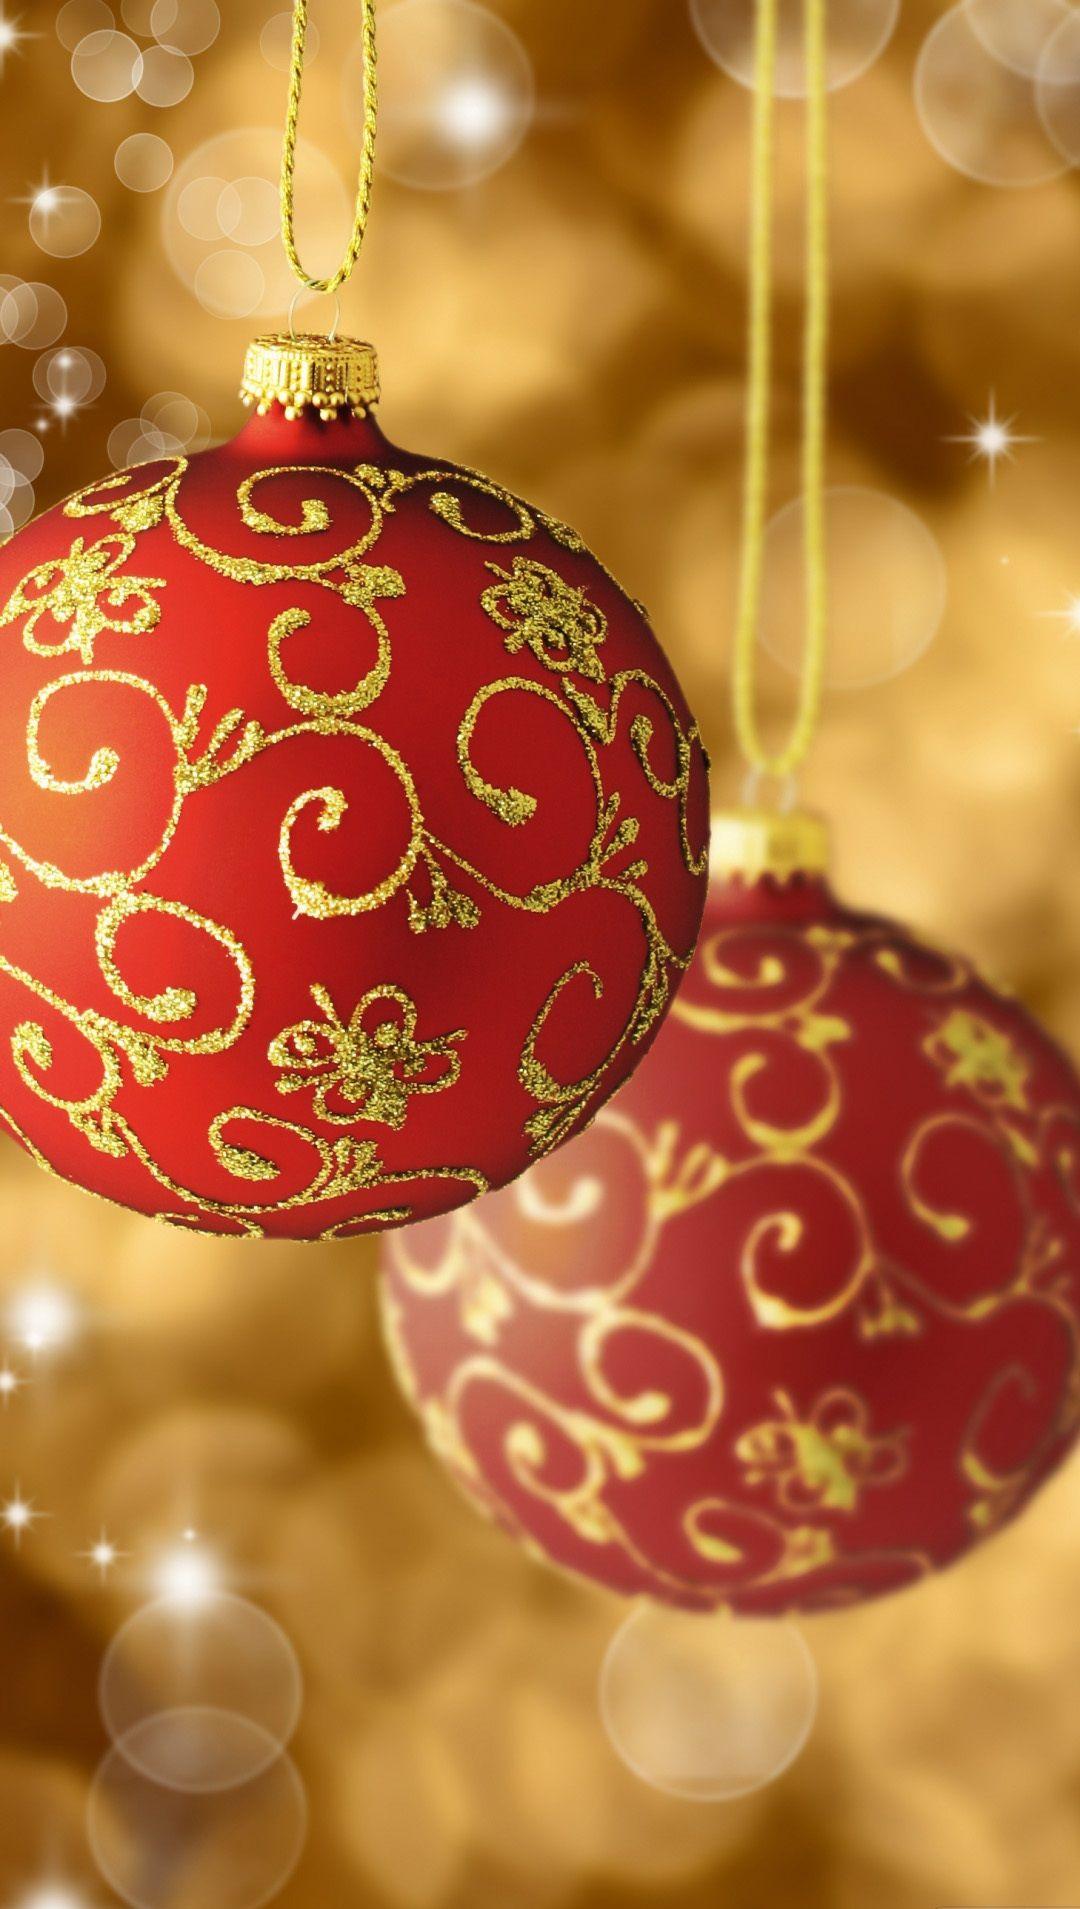 Red and gold christmas ornaments - Samsung Galaxy Wallpaper Christmas Christmas Holidays Lock Screen 1080x1920 Samsung Galaxy Note 3